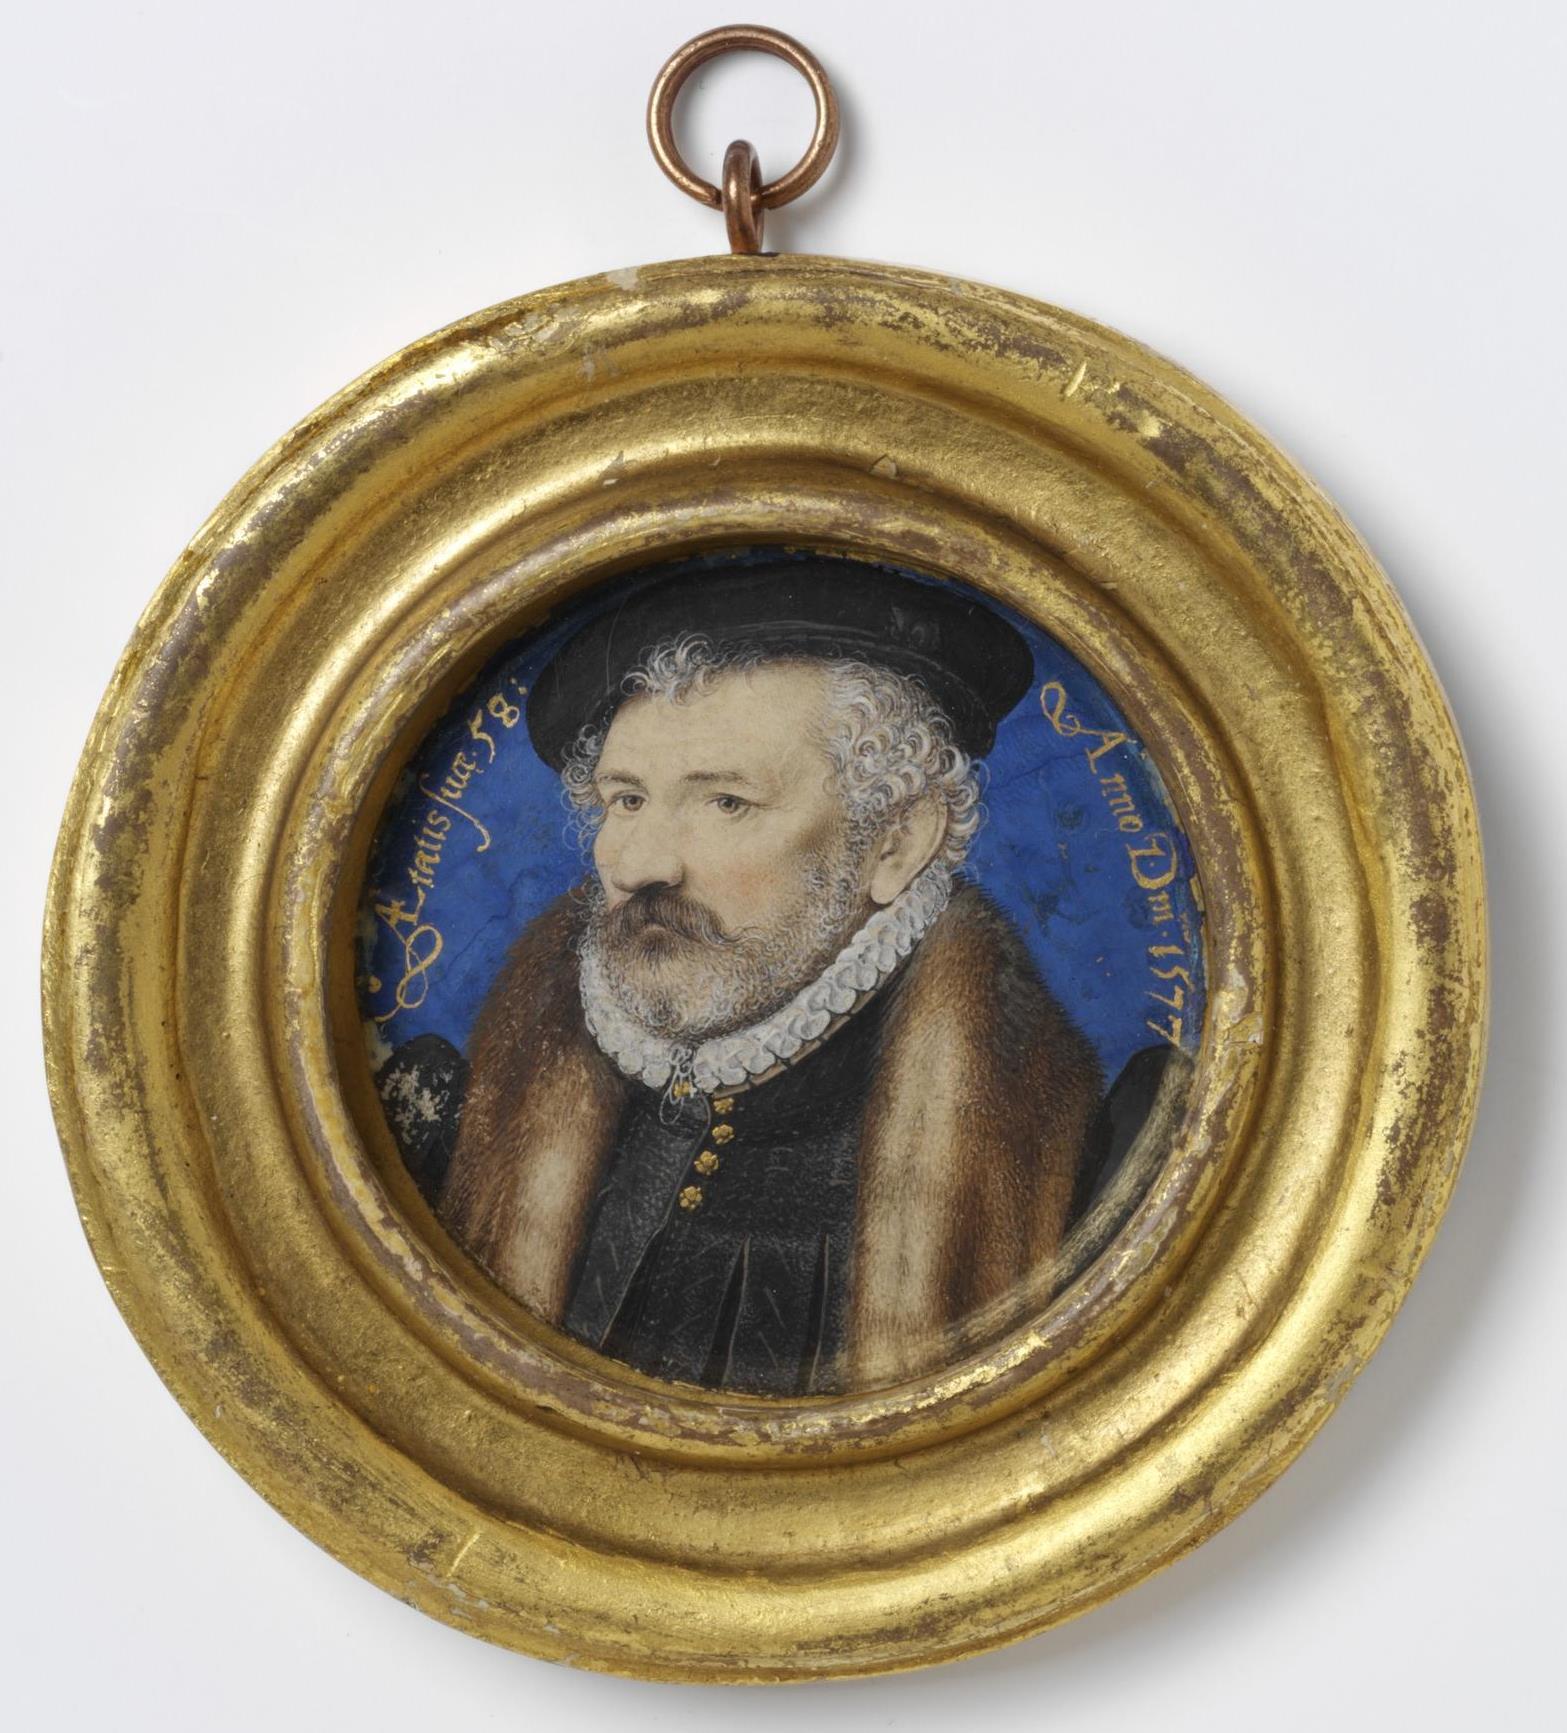 Richard Hilliard by Nicholas Hilliard, 1576/77, watercolour on vellum laid onto plain card © Victoria and Albert Museum, London 2019